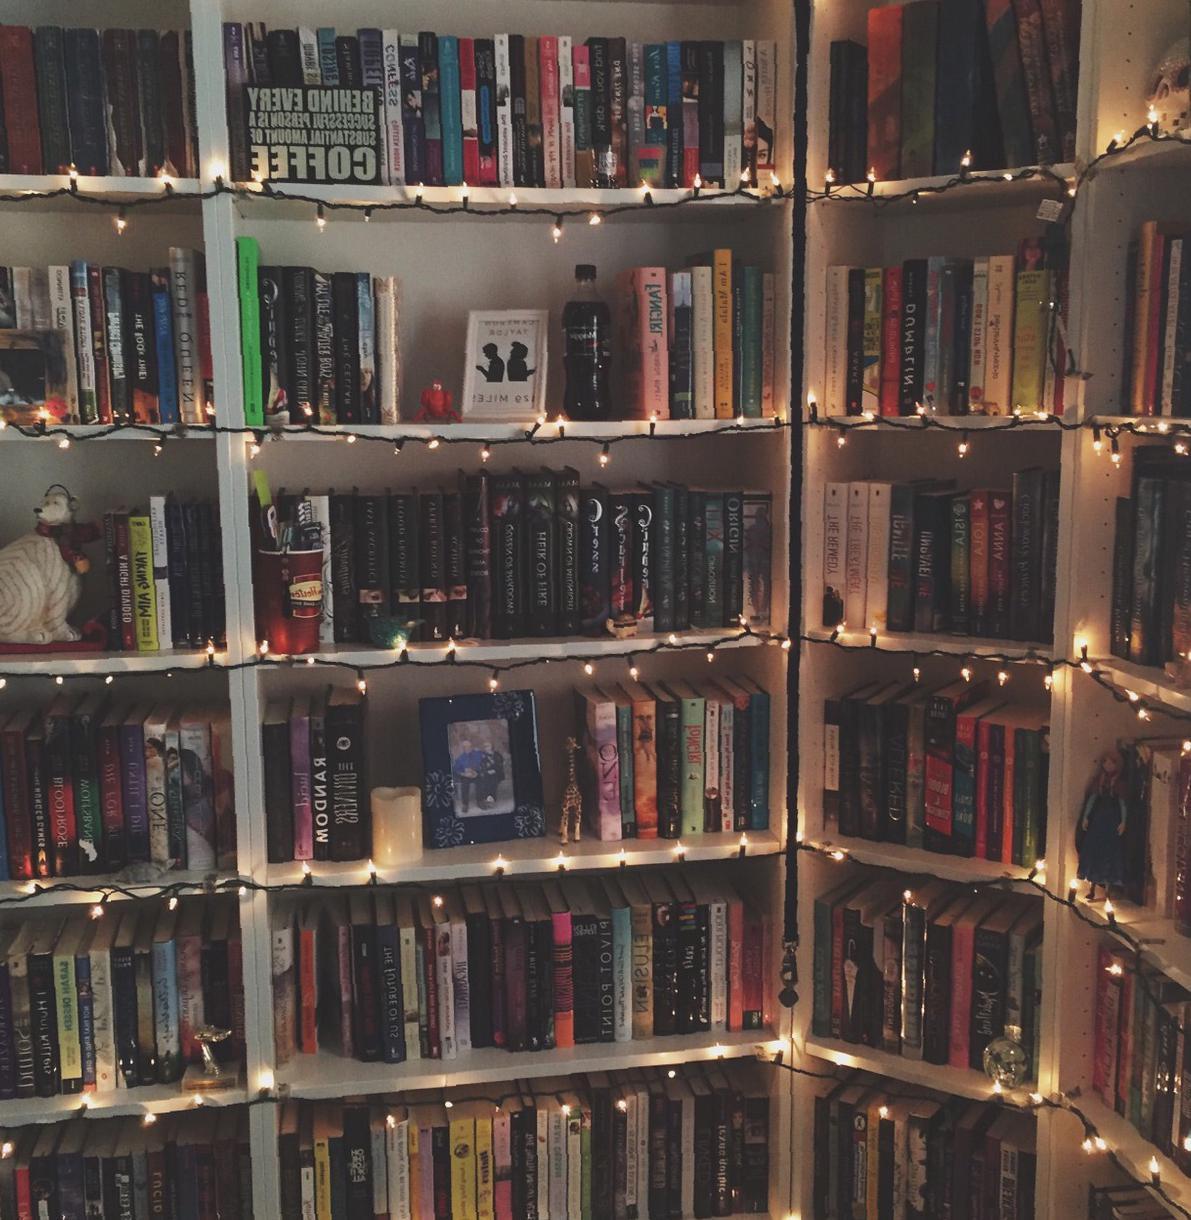 35 NICE BOOKSHELVES INSPIRATION SPARK YOUR IDEA bookshelf ideas, home decoration, book organization ideas, home book organize ideas